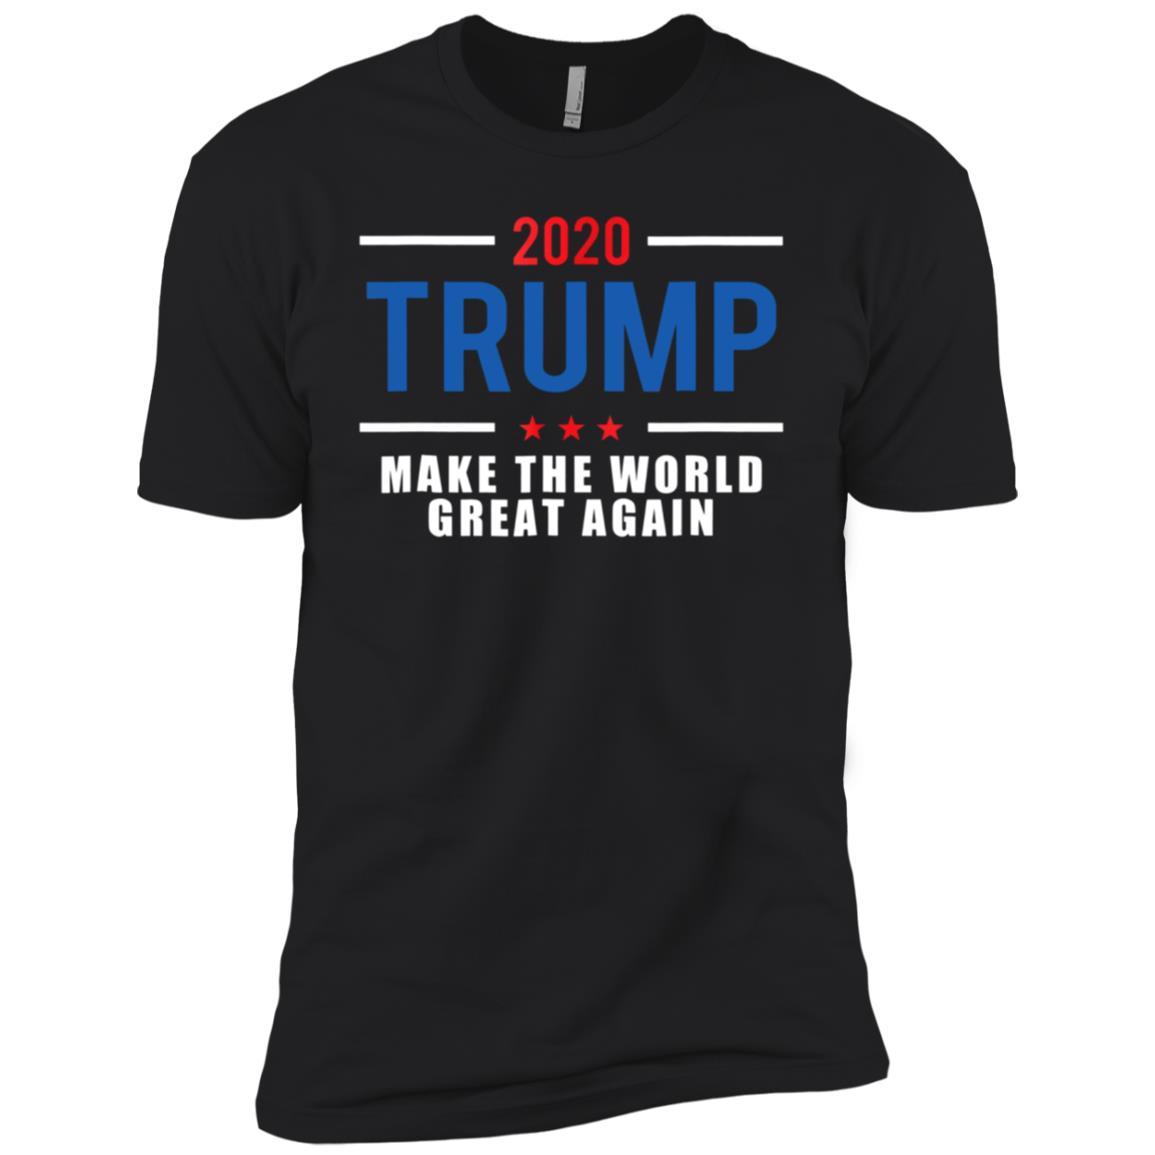 2020 Trump Make The World Great Again Men Short Sleeve T-Shirt